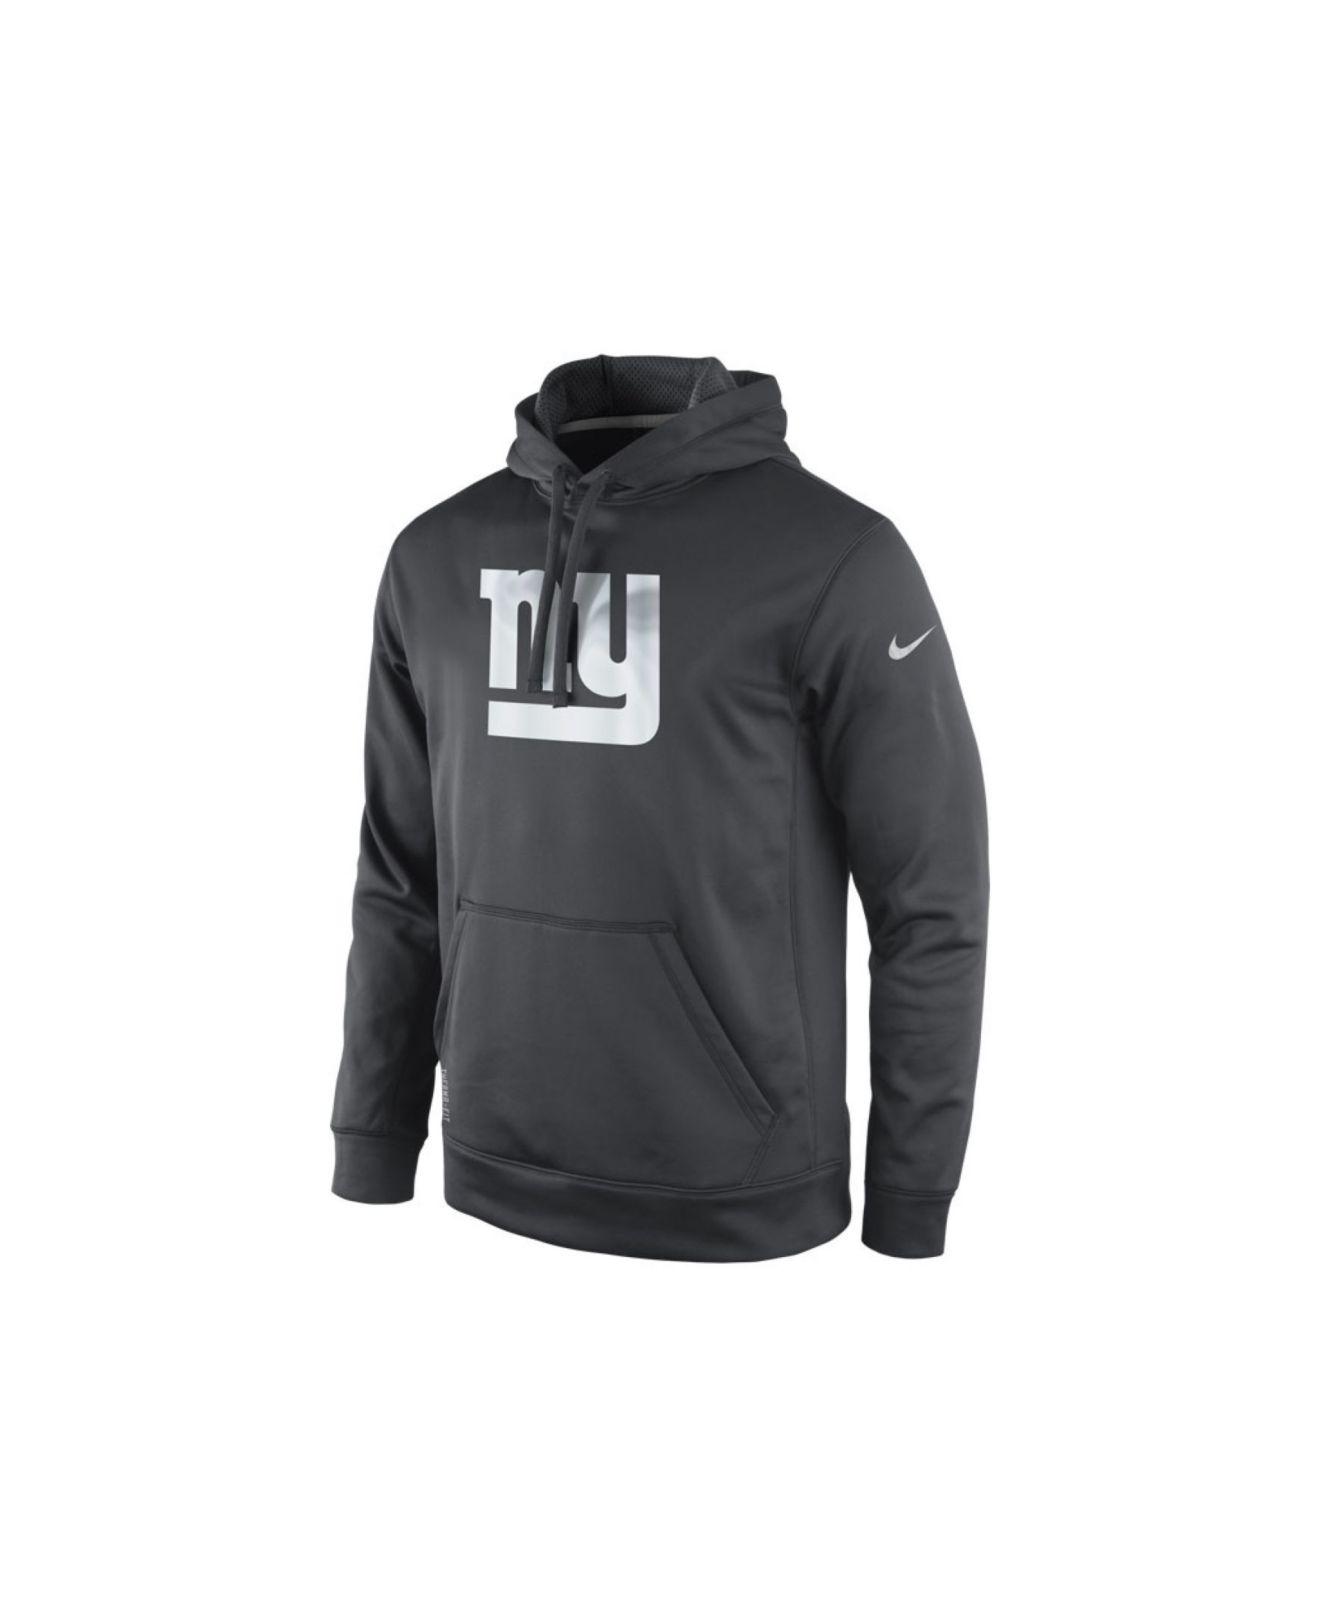 ff4b5f8bbd3 Nike Mens New York Giants Platinum Ko Hoodie in Gray for Men - Lyst